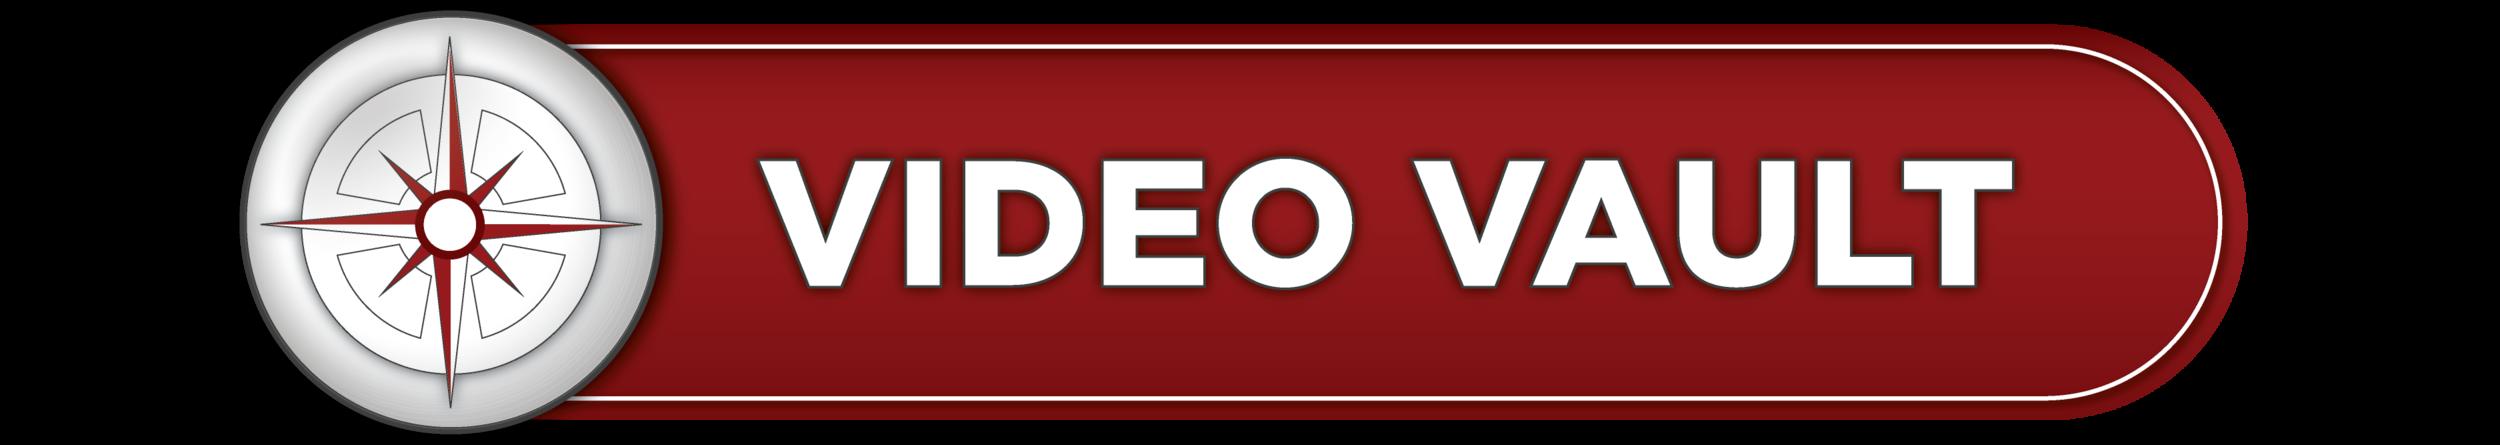 Button (Video Vault)-01.png